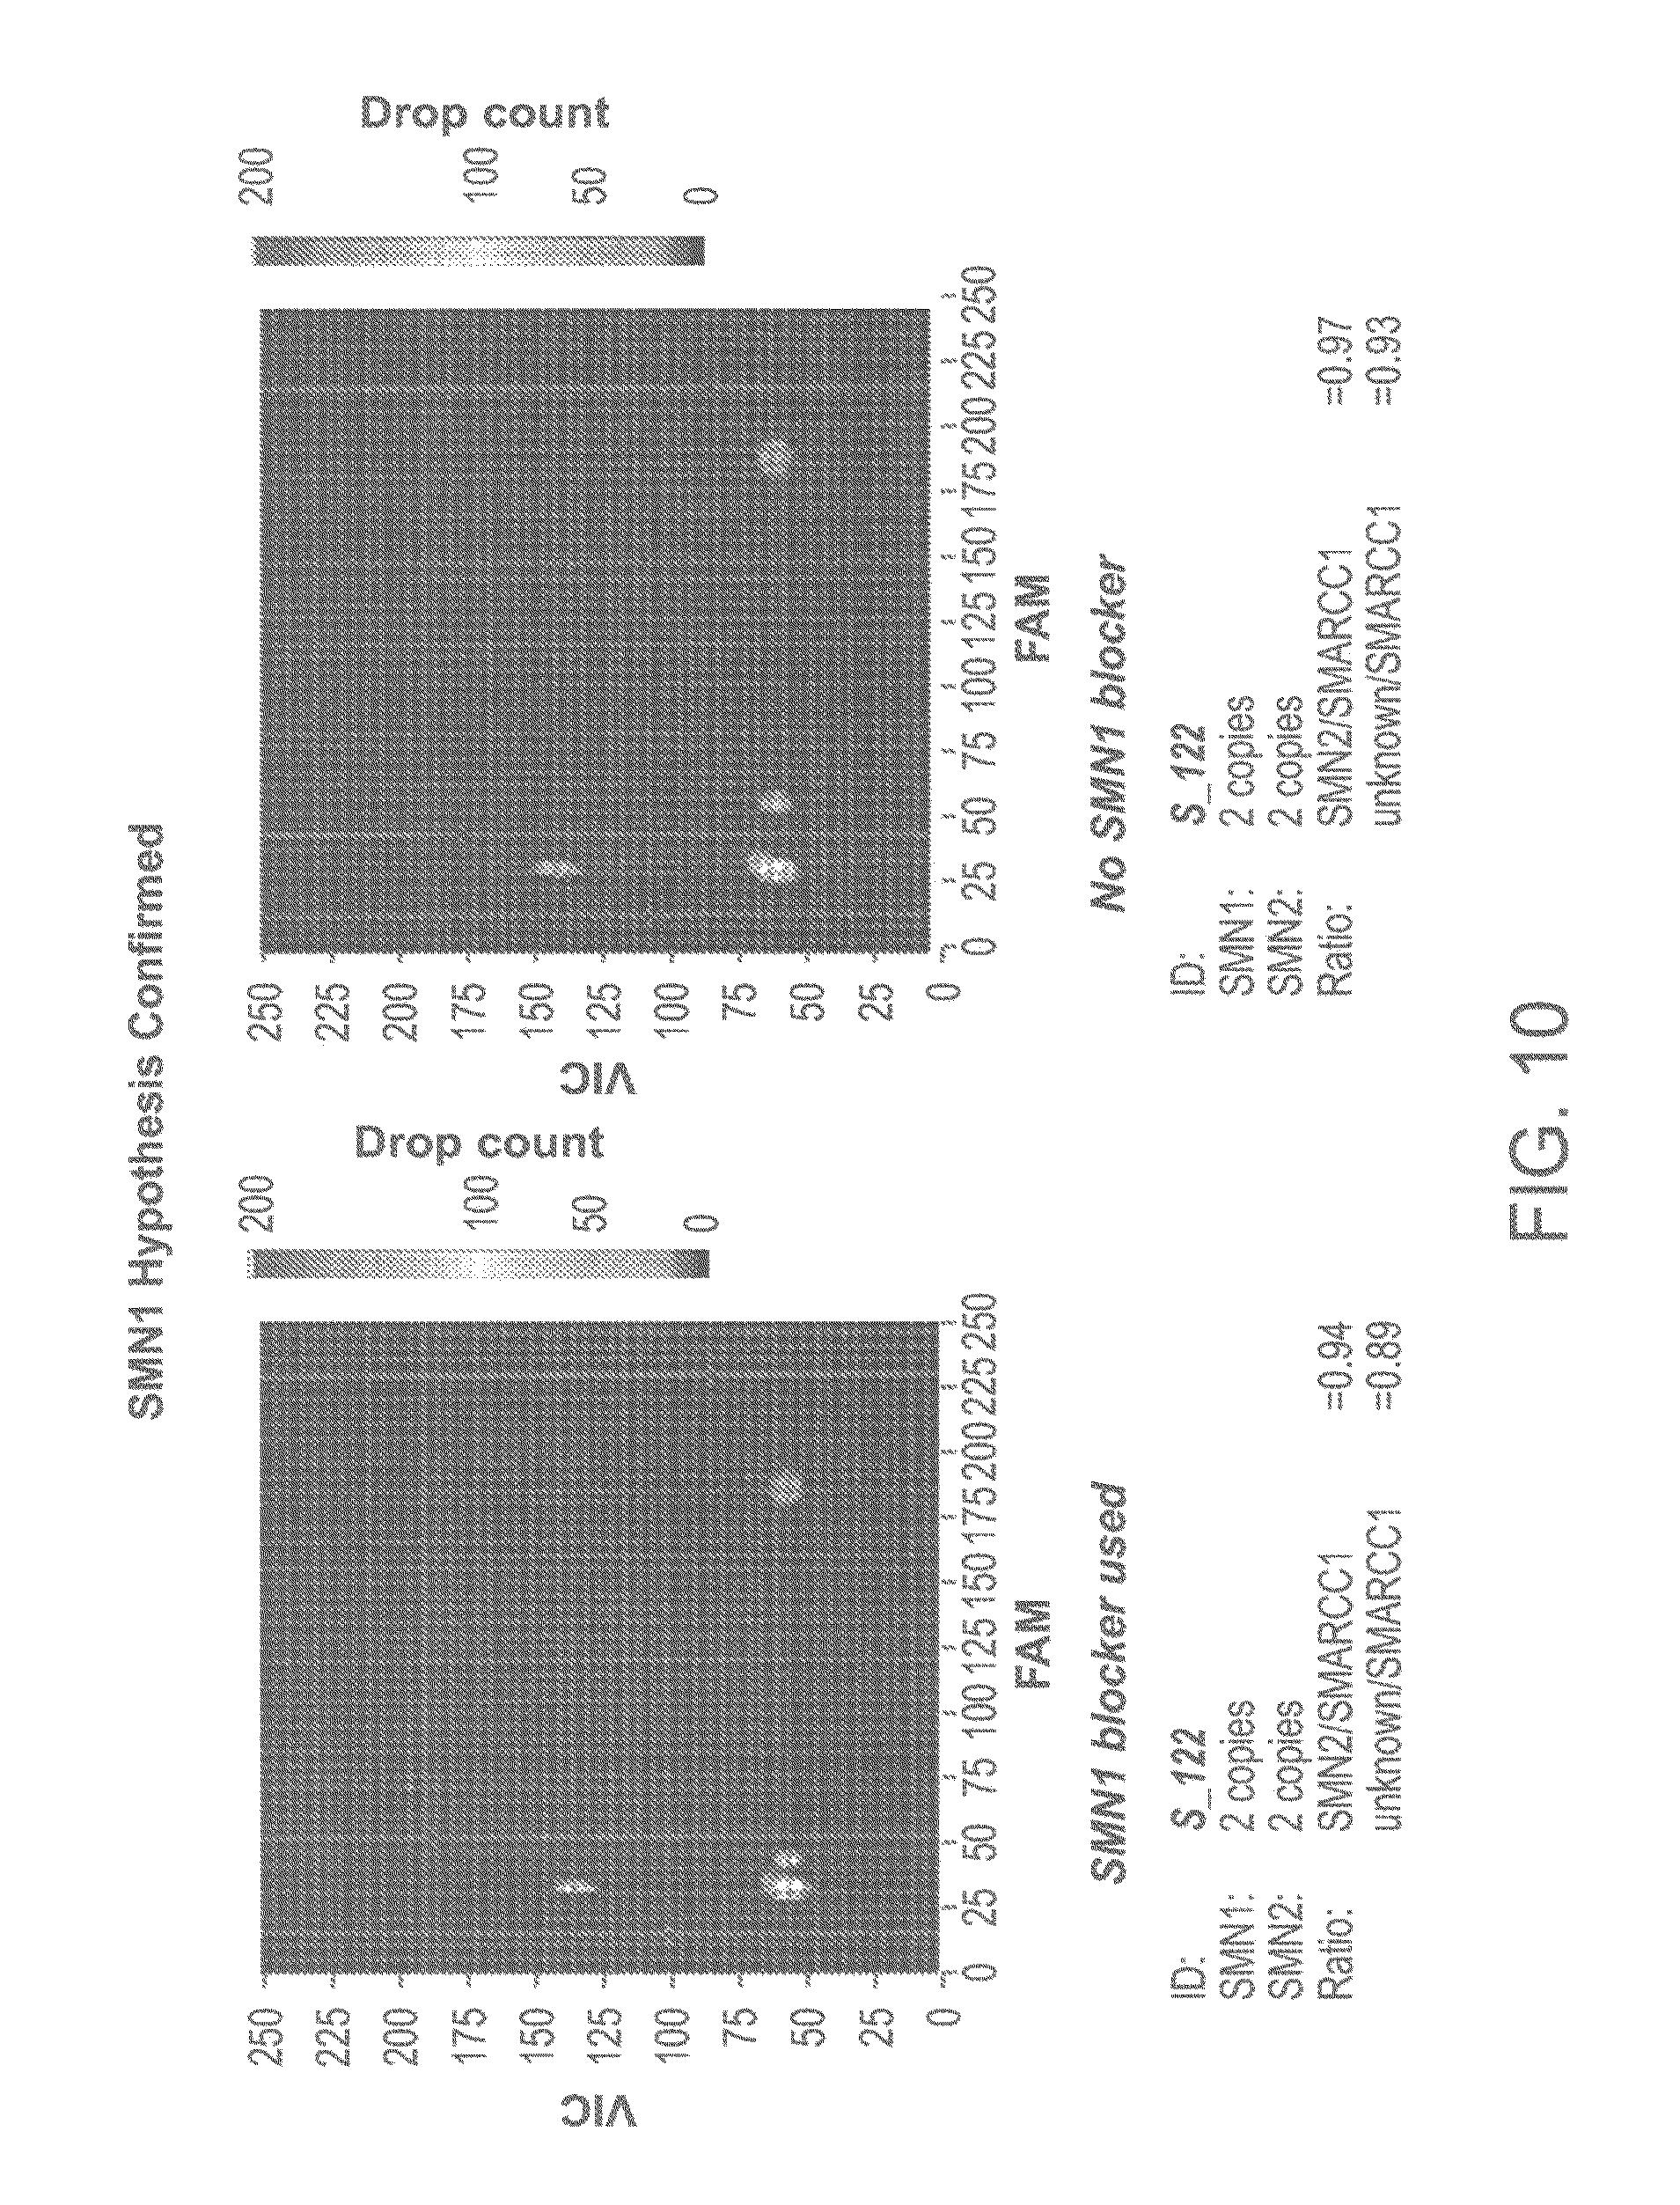 Patent US 9,399,797 B2